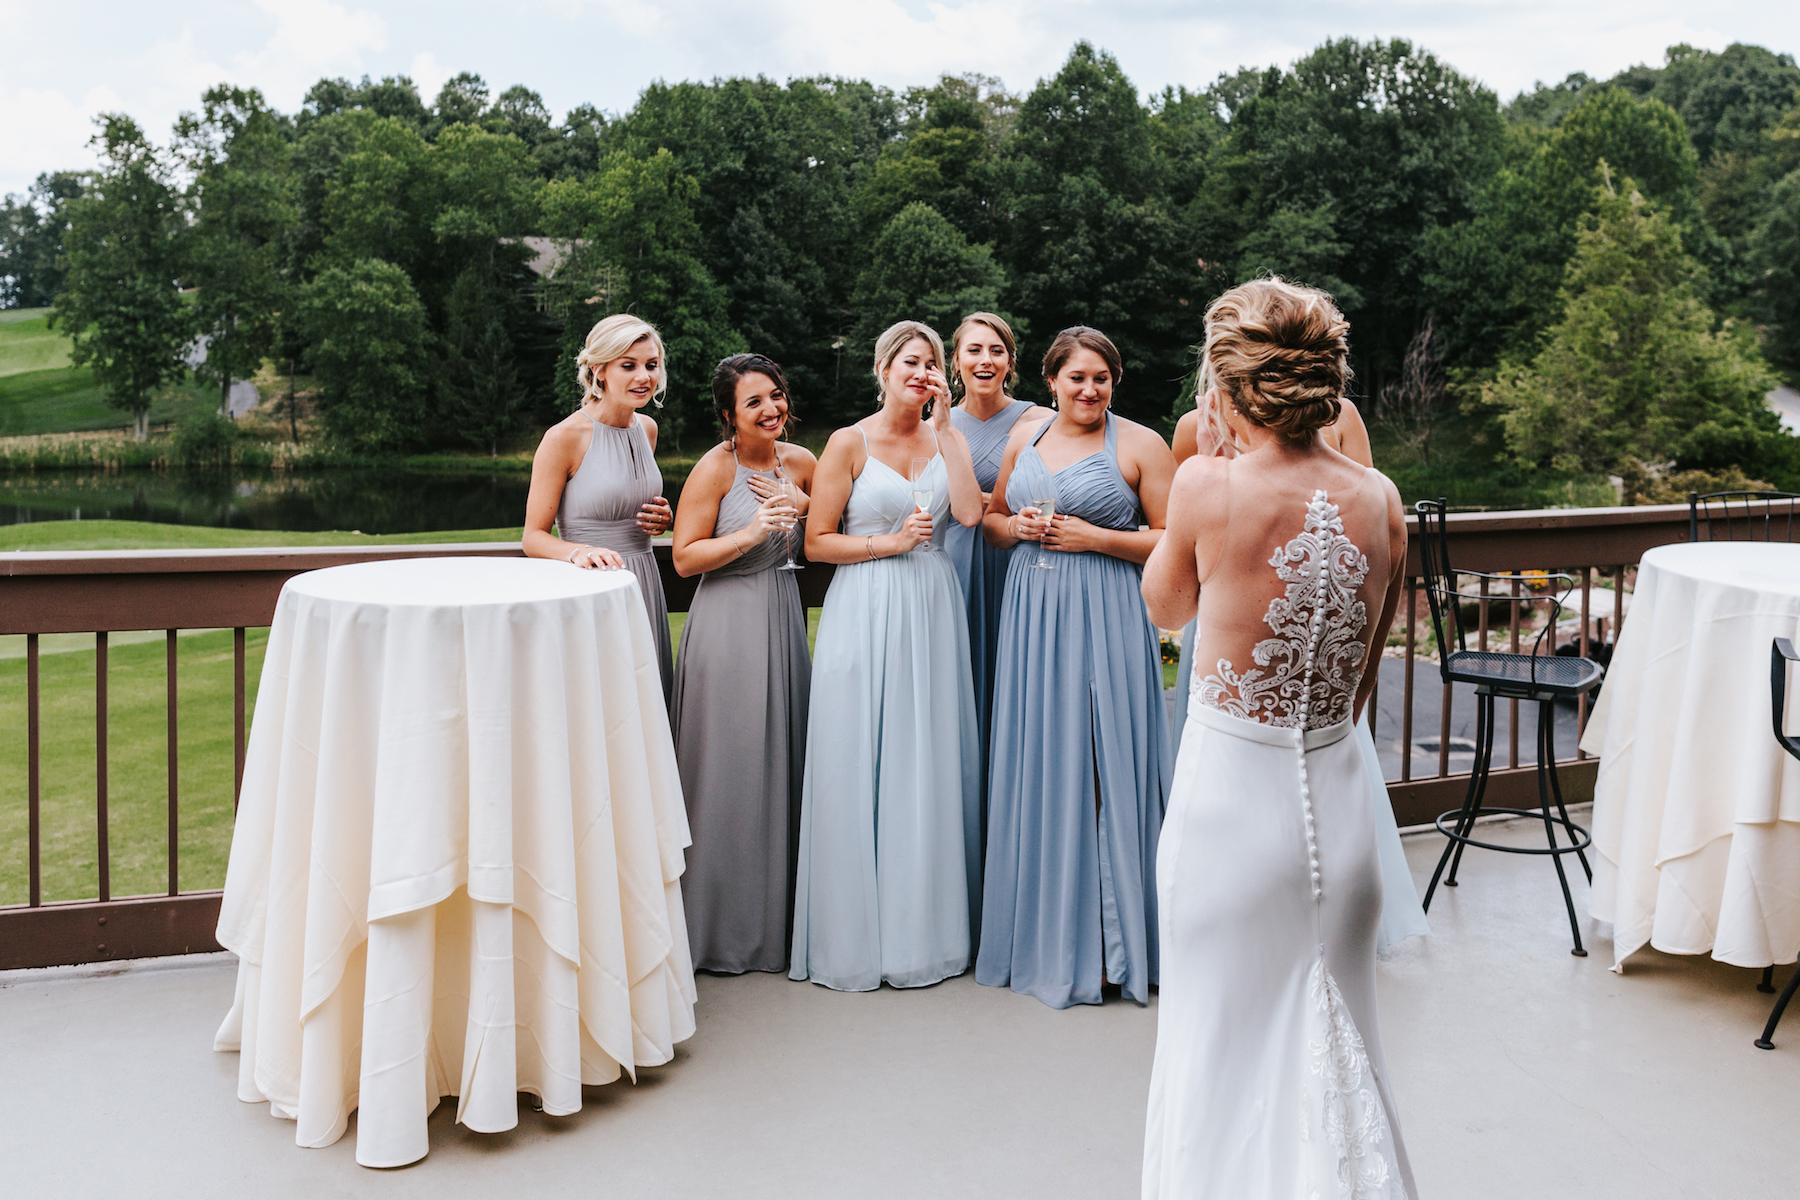 wedding-engagement-photographer-spartanburg-greenville-columbia-carolina-south-north-458.JPG